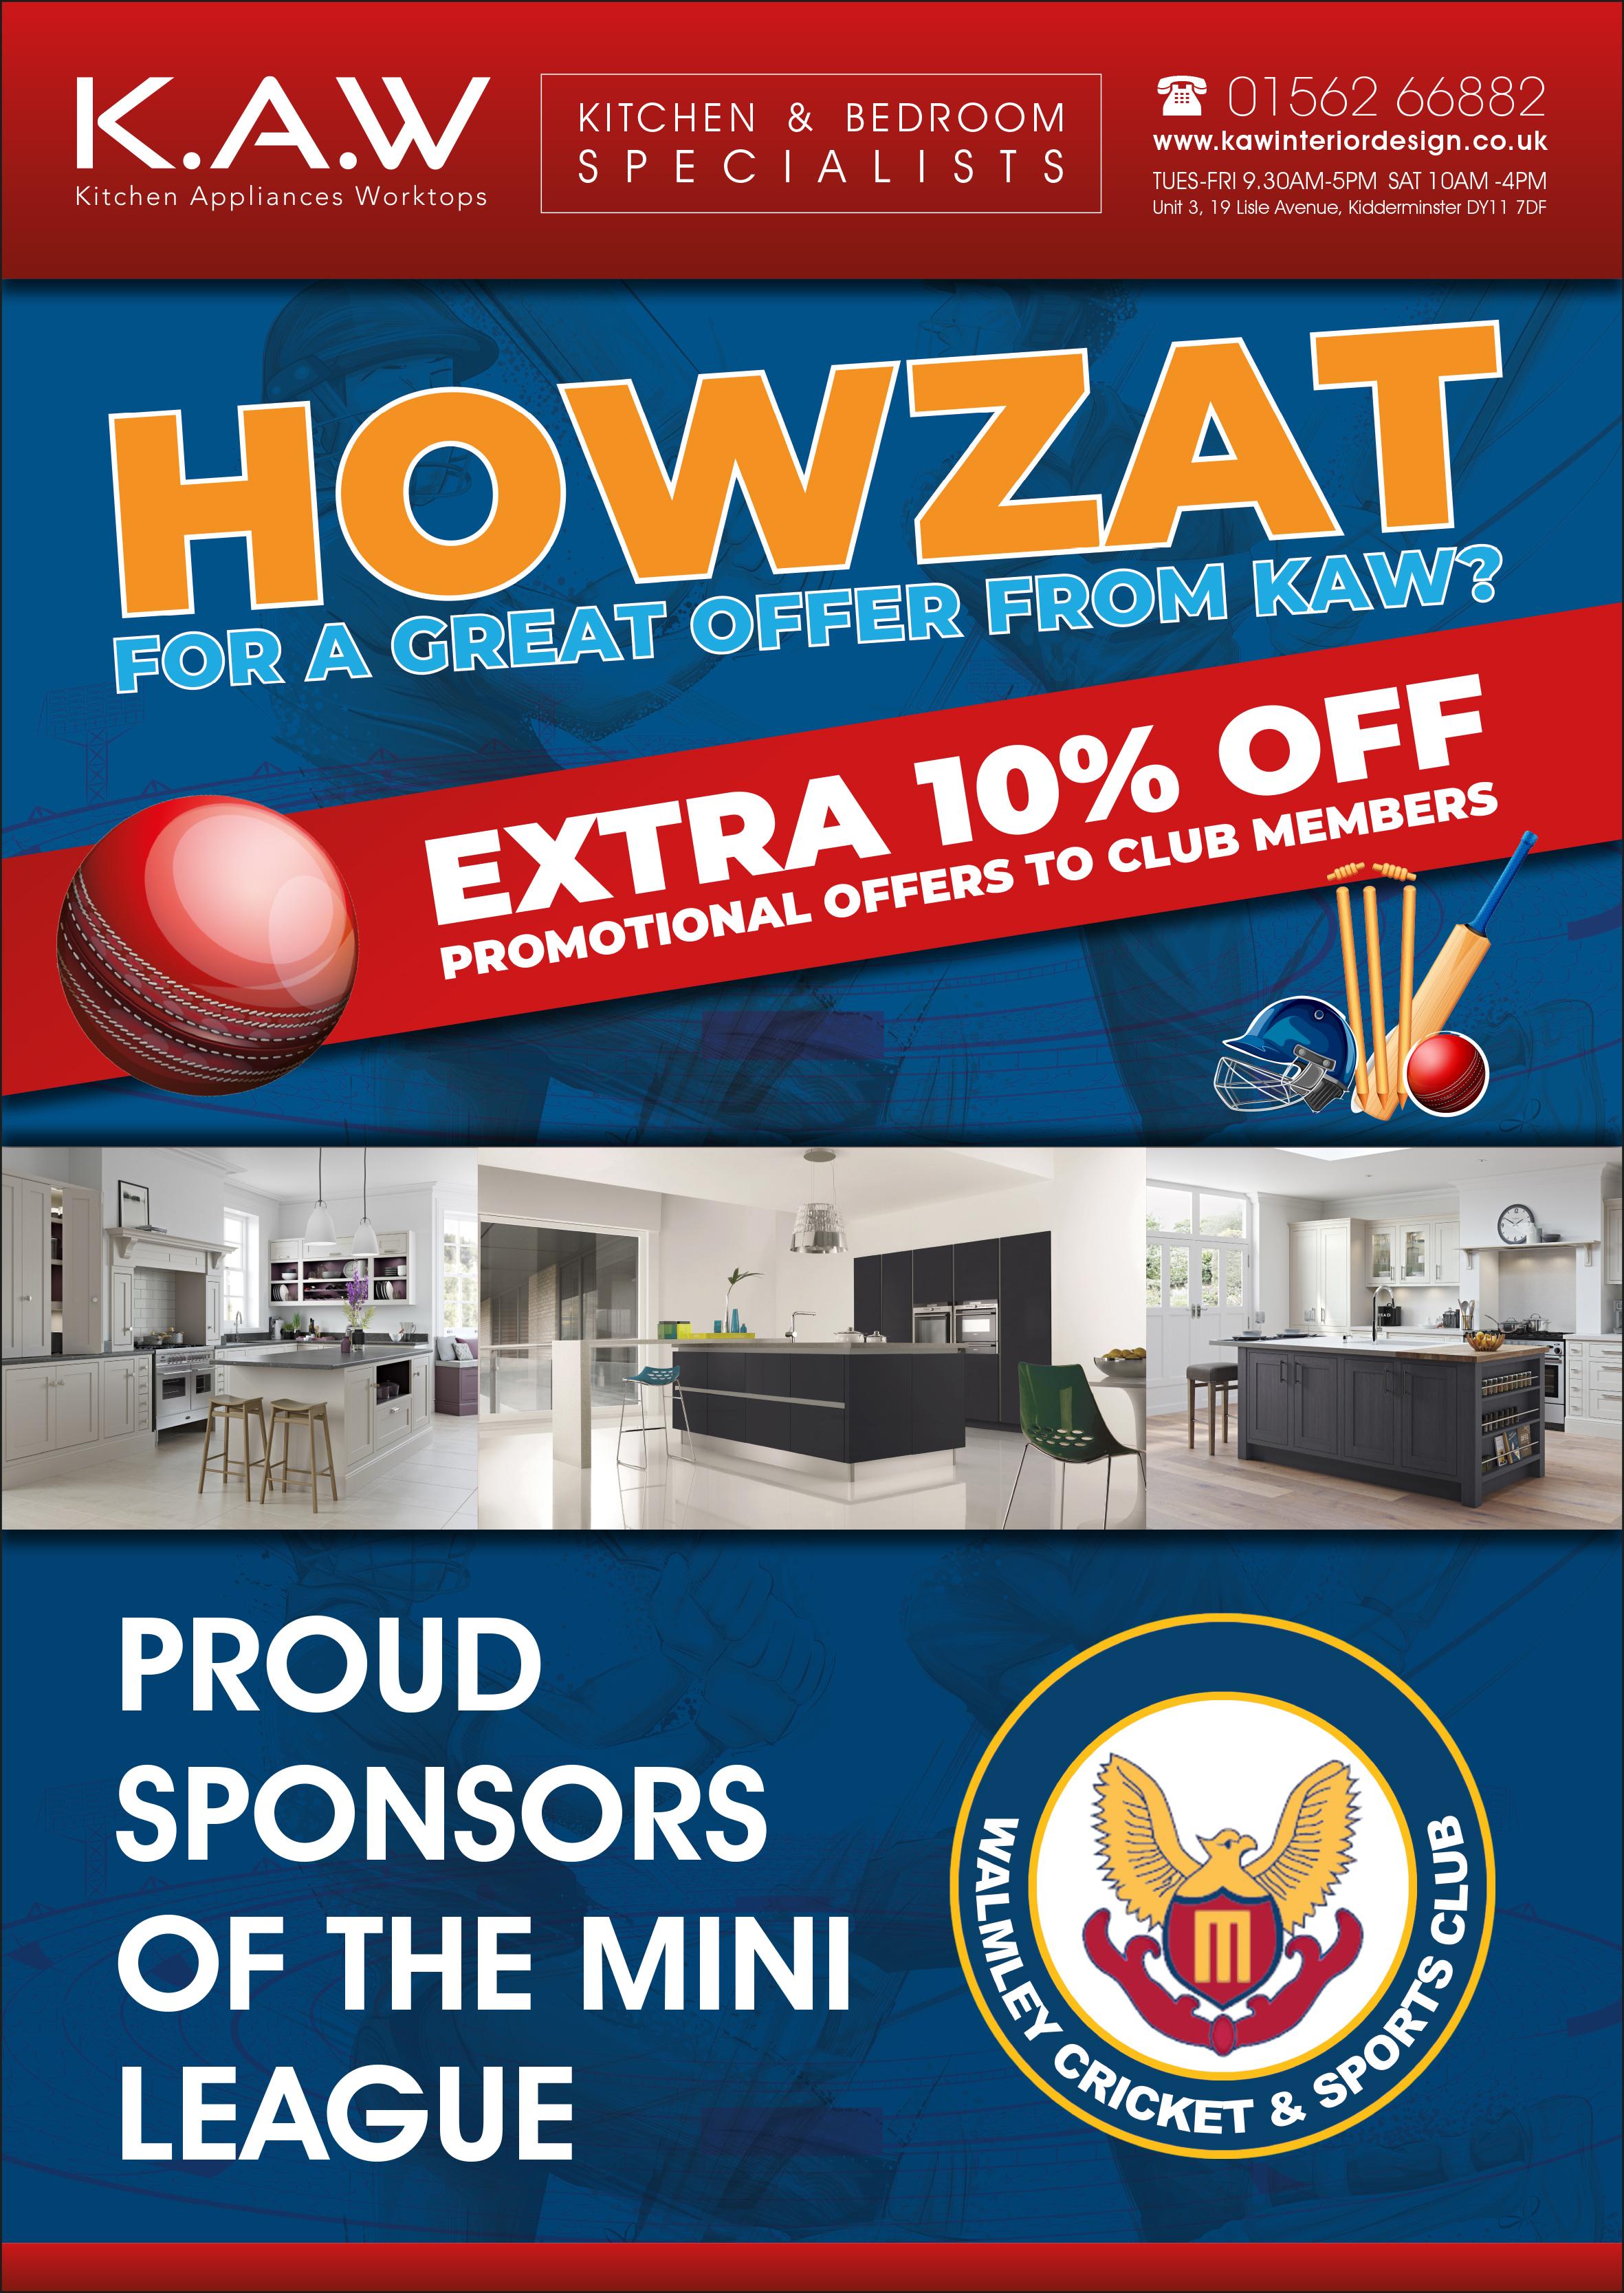 Mini League Sponsors' Offer for Members